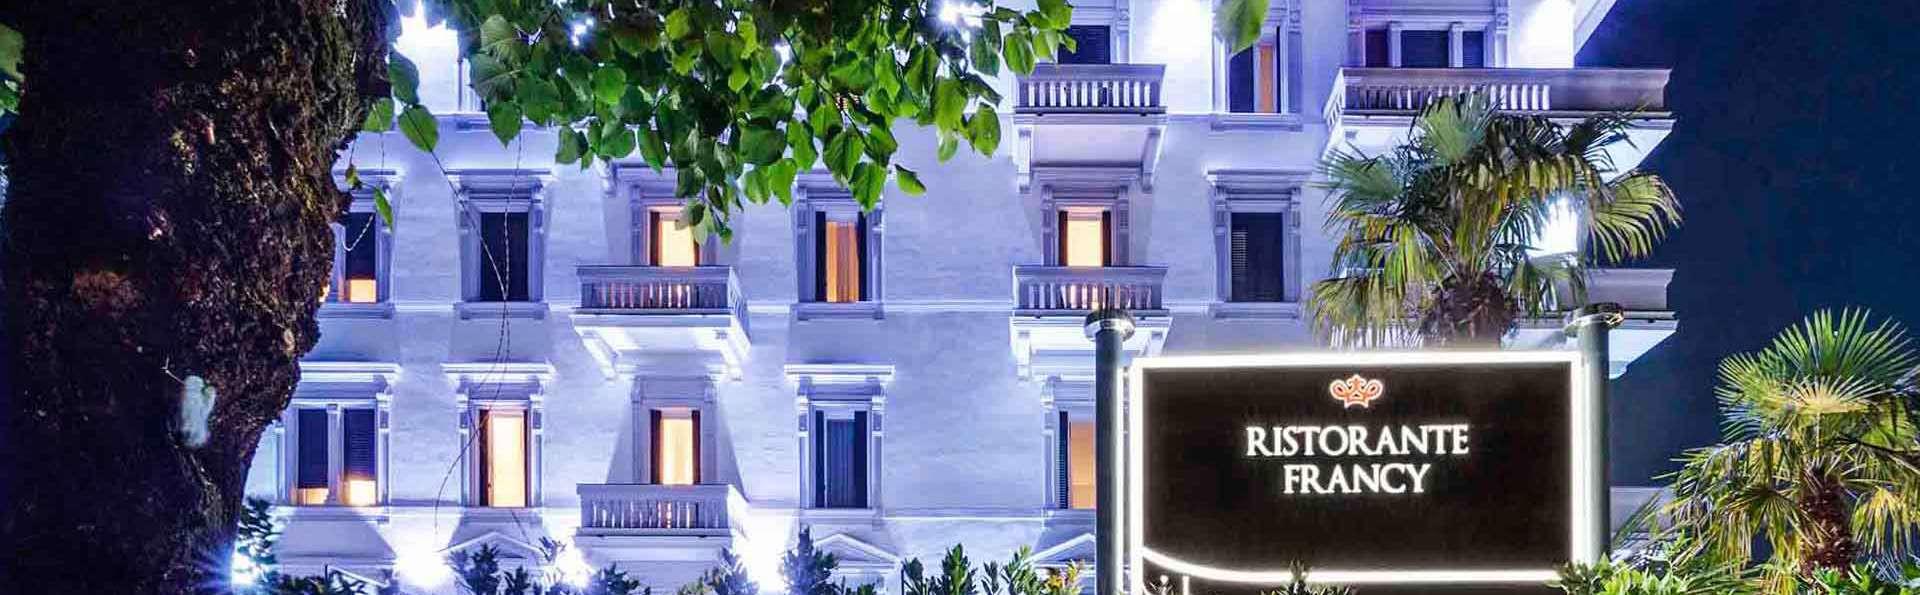 LHP Hotel Montecatini Palace & SPA - EDIT_FRONT_ENTRACE_FRANCY_RESTAURANT_01.jpg